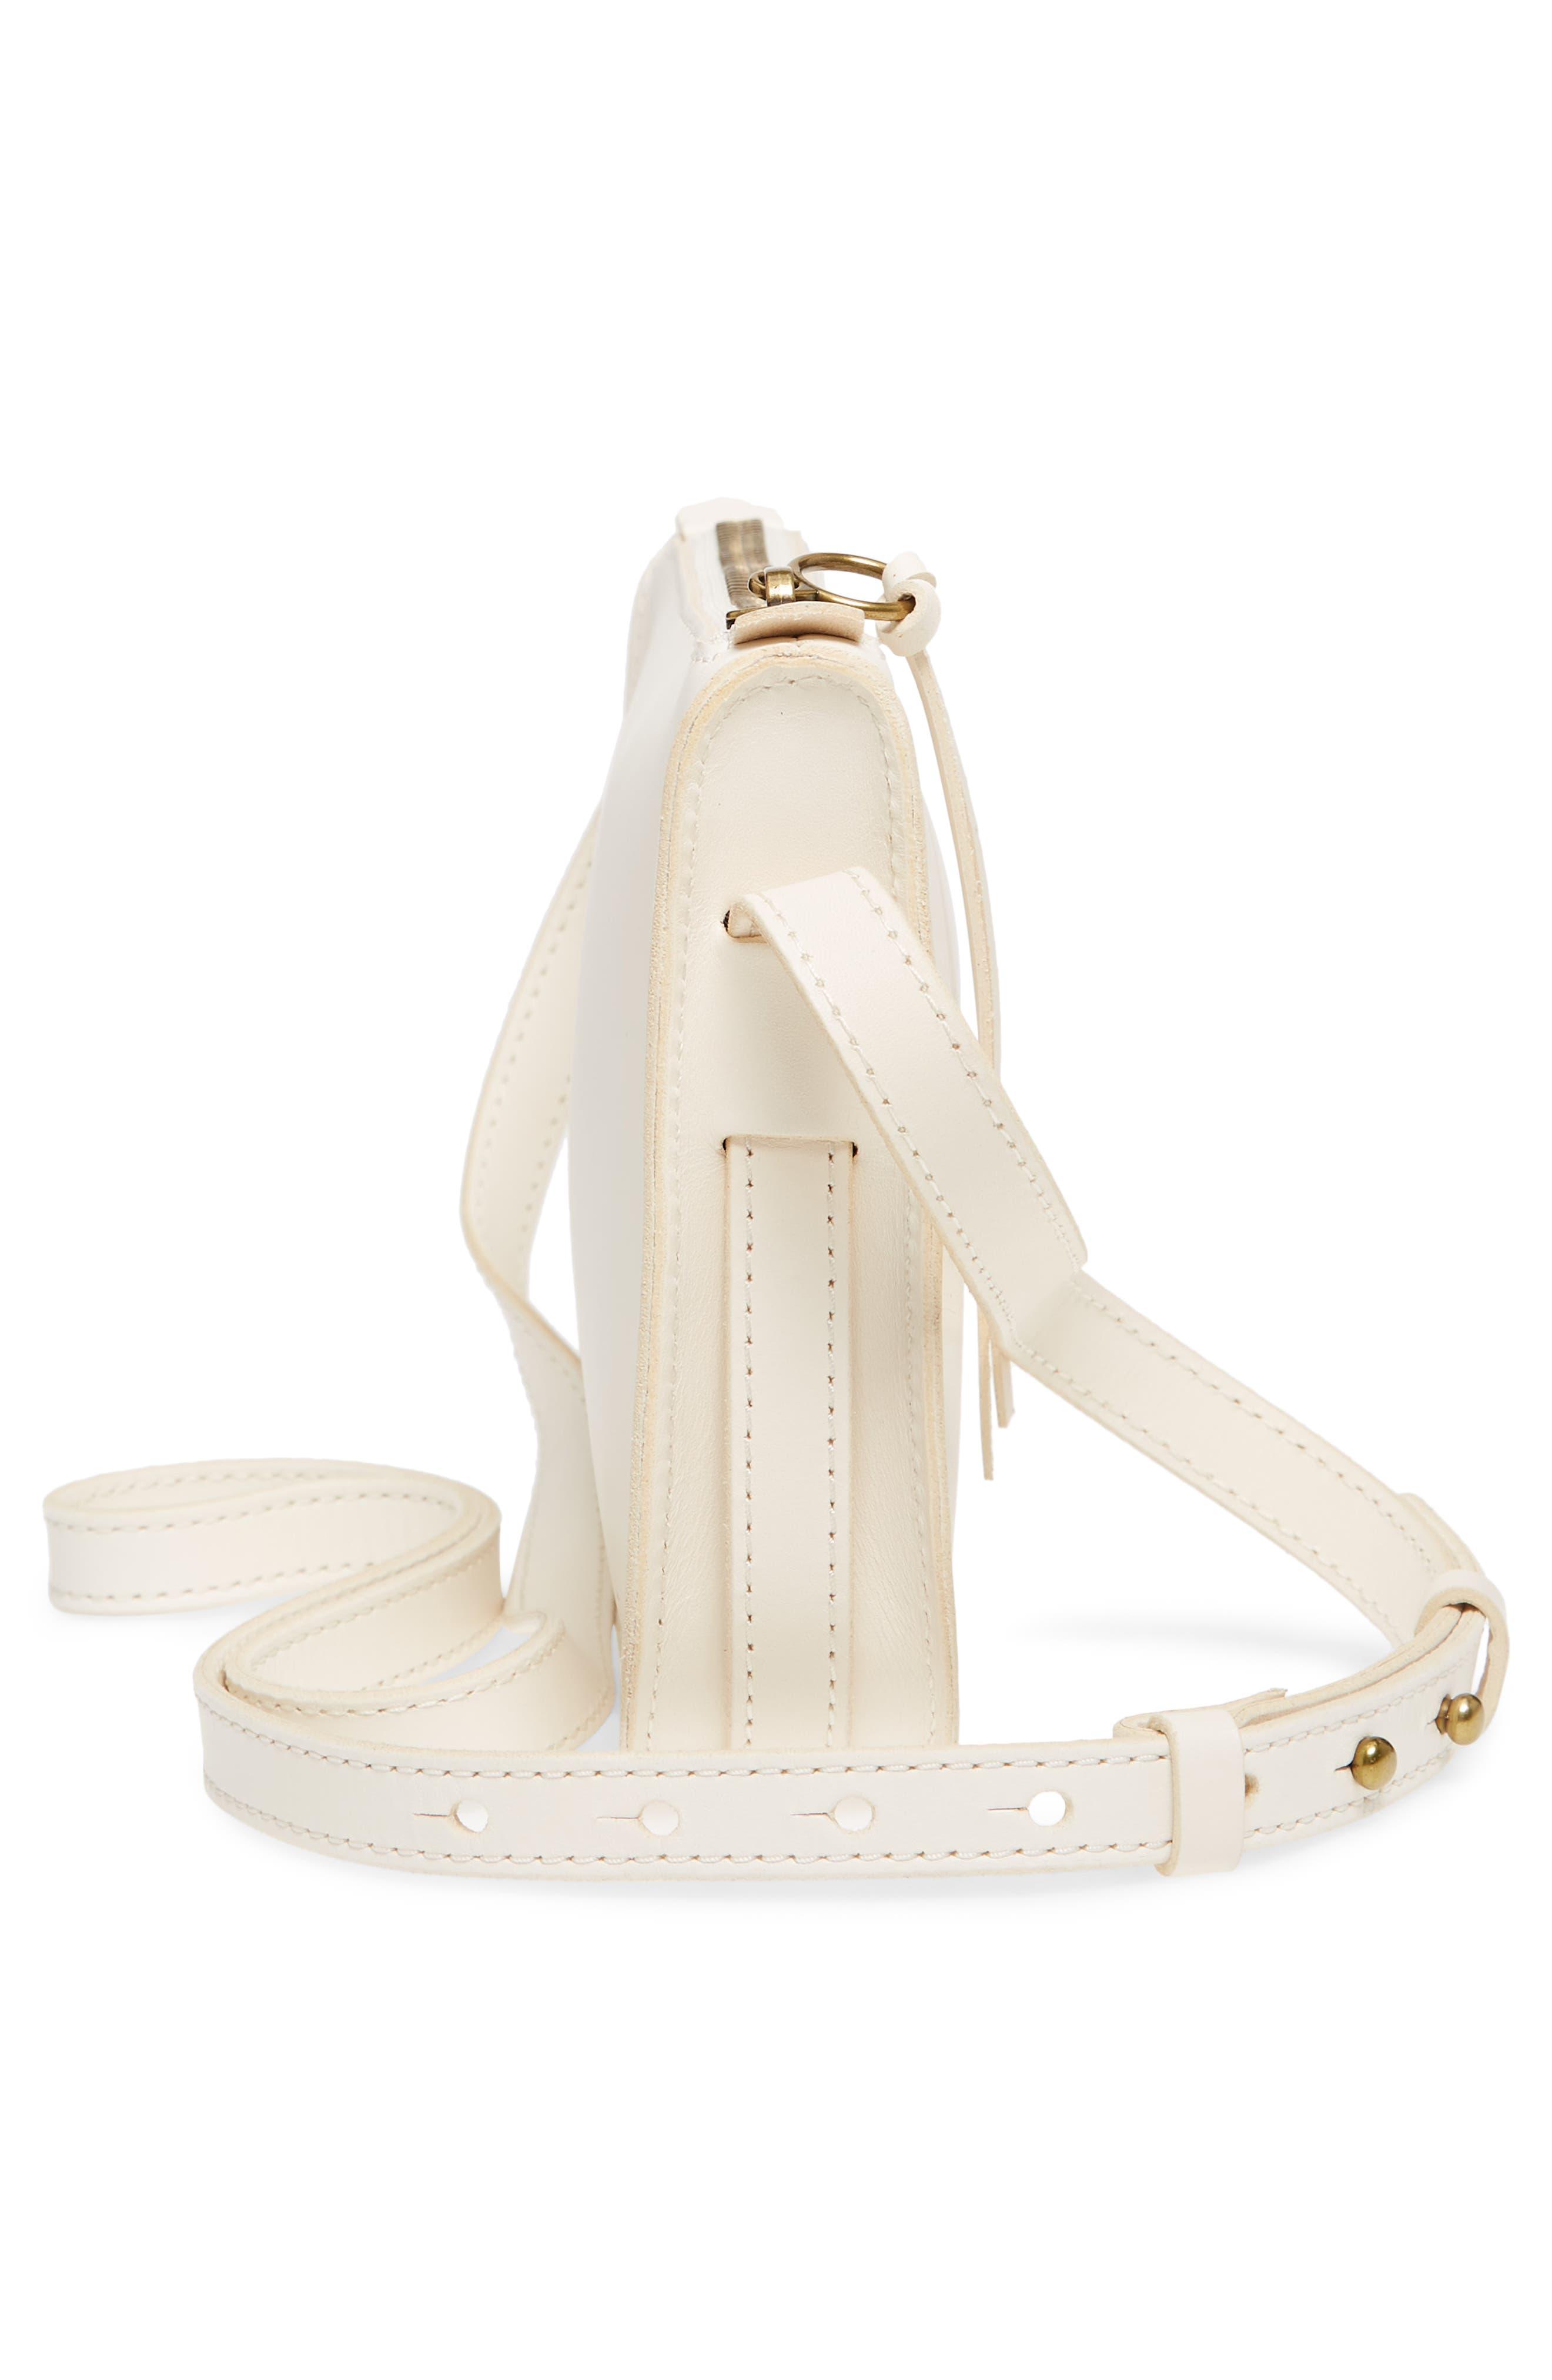 Simple Leather Crossbody Bag,                             Alternate thumbnail 5, color,                             VINTAGE CANVAS